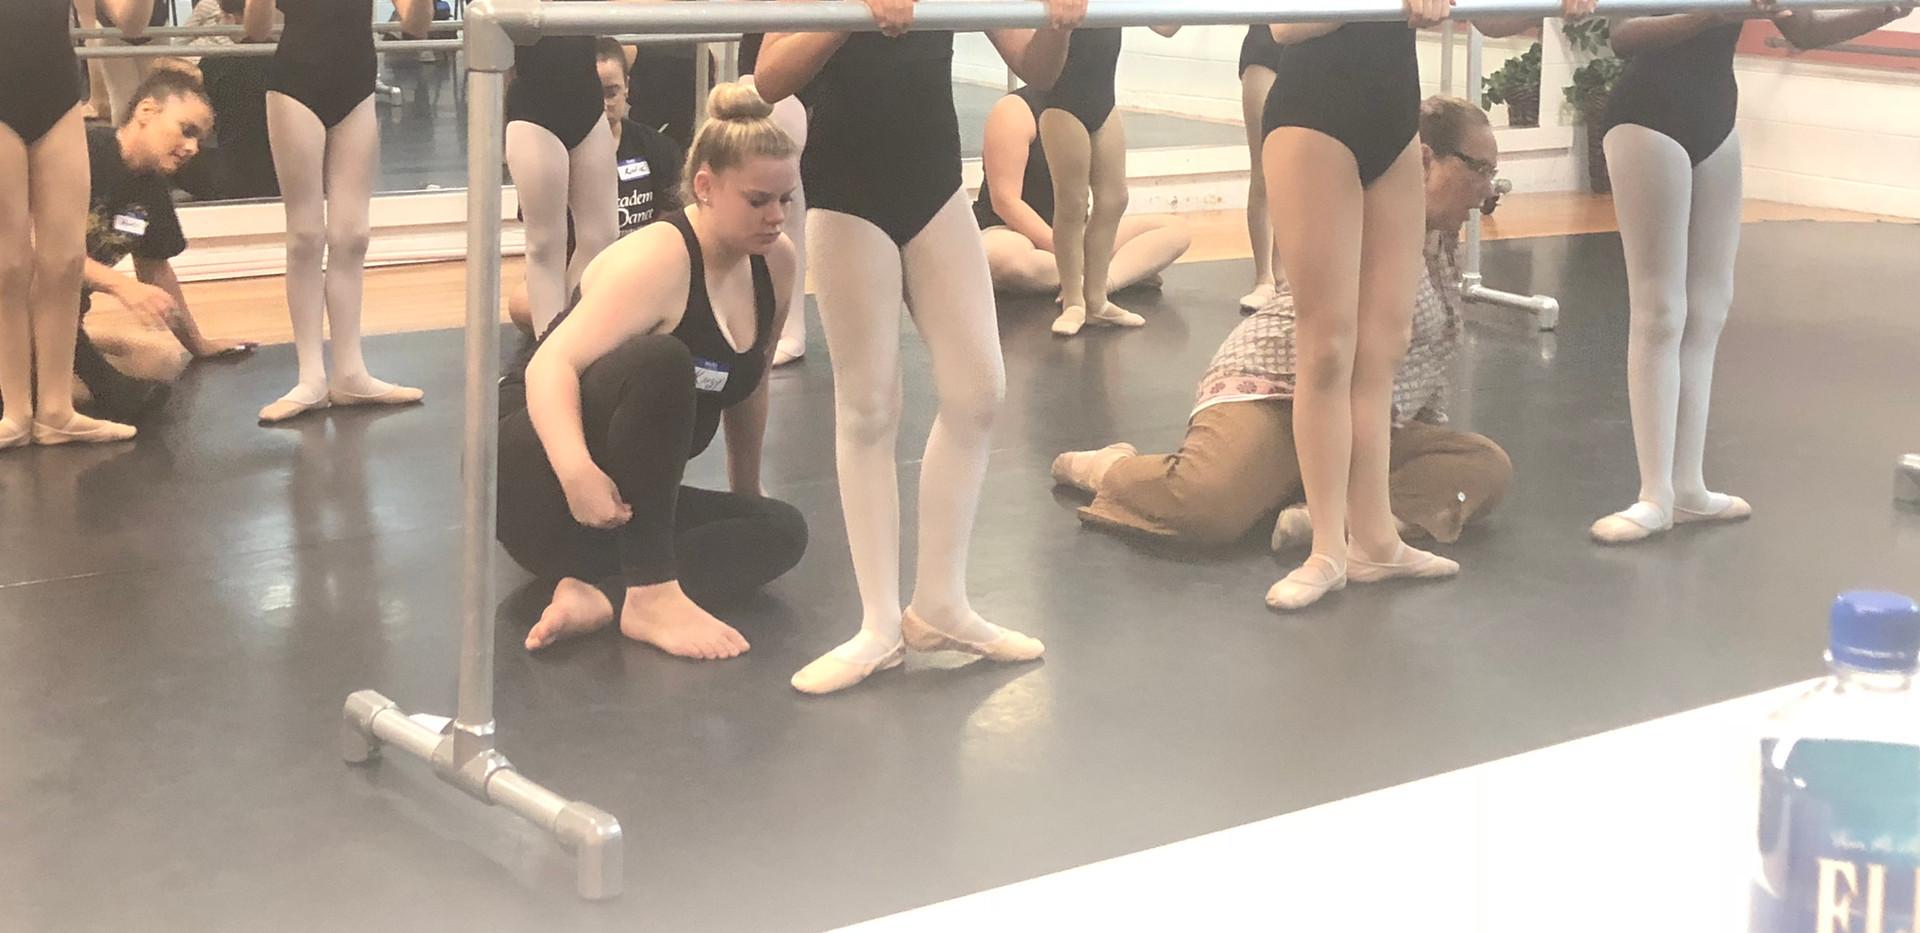 Academy assistant teachers learn proper foot placement during teacher training.